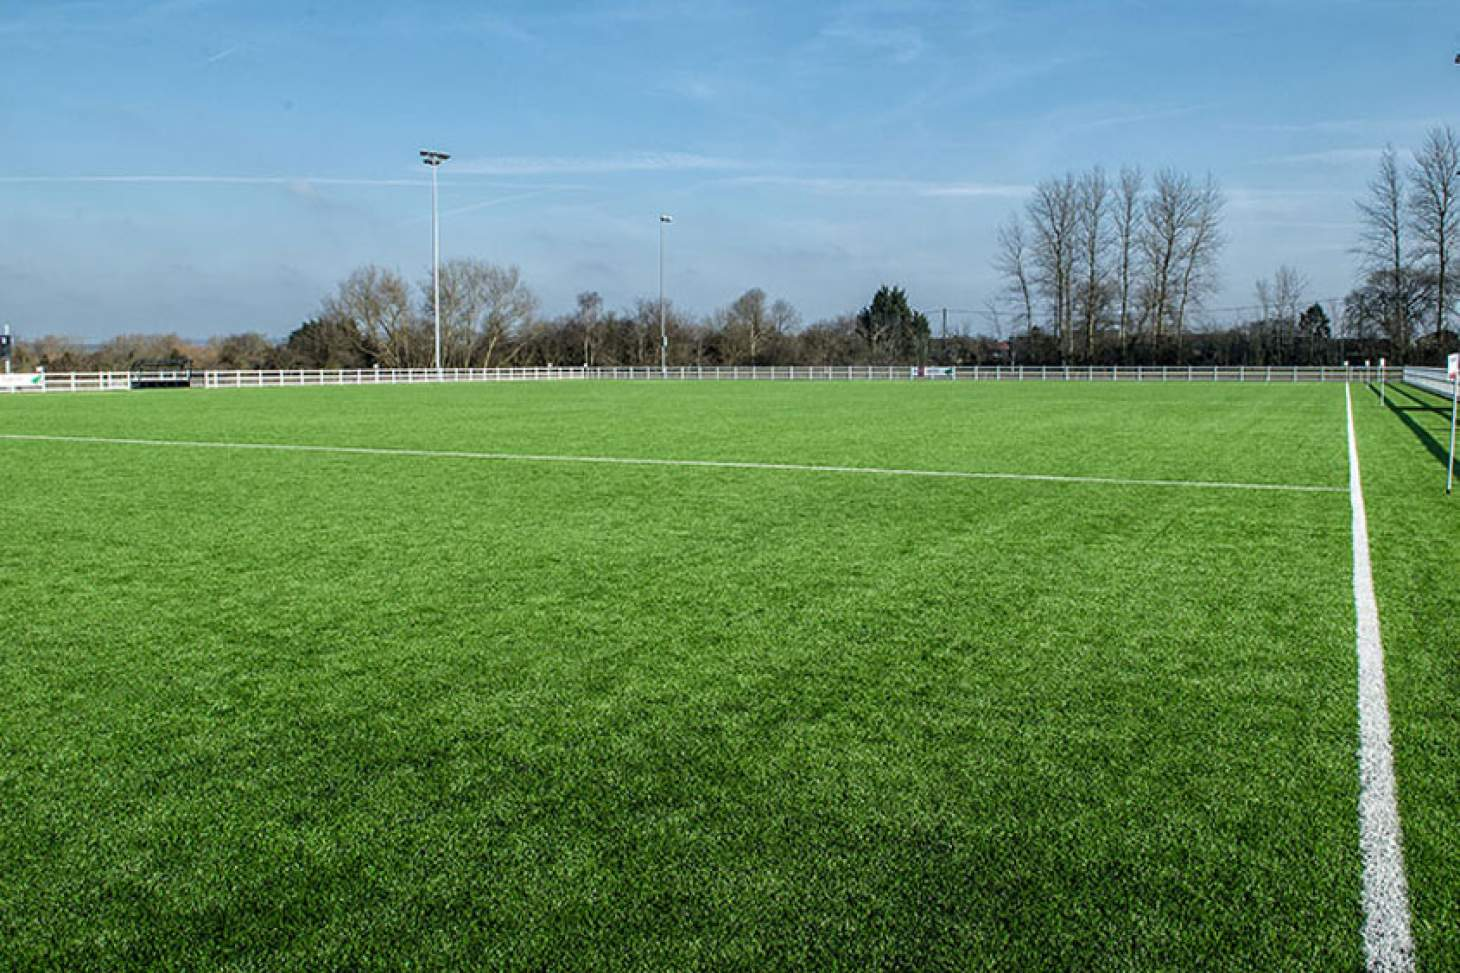 PlayFootball Blaydon 8 a side | 3G Astroturf football pitch